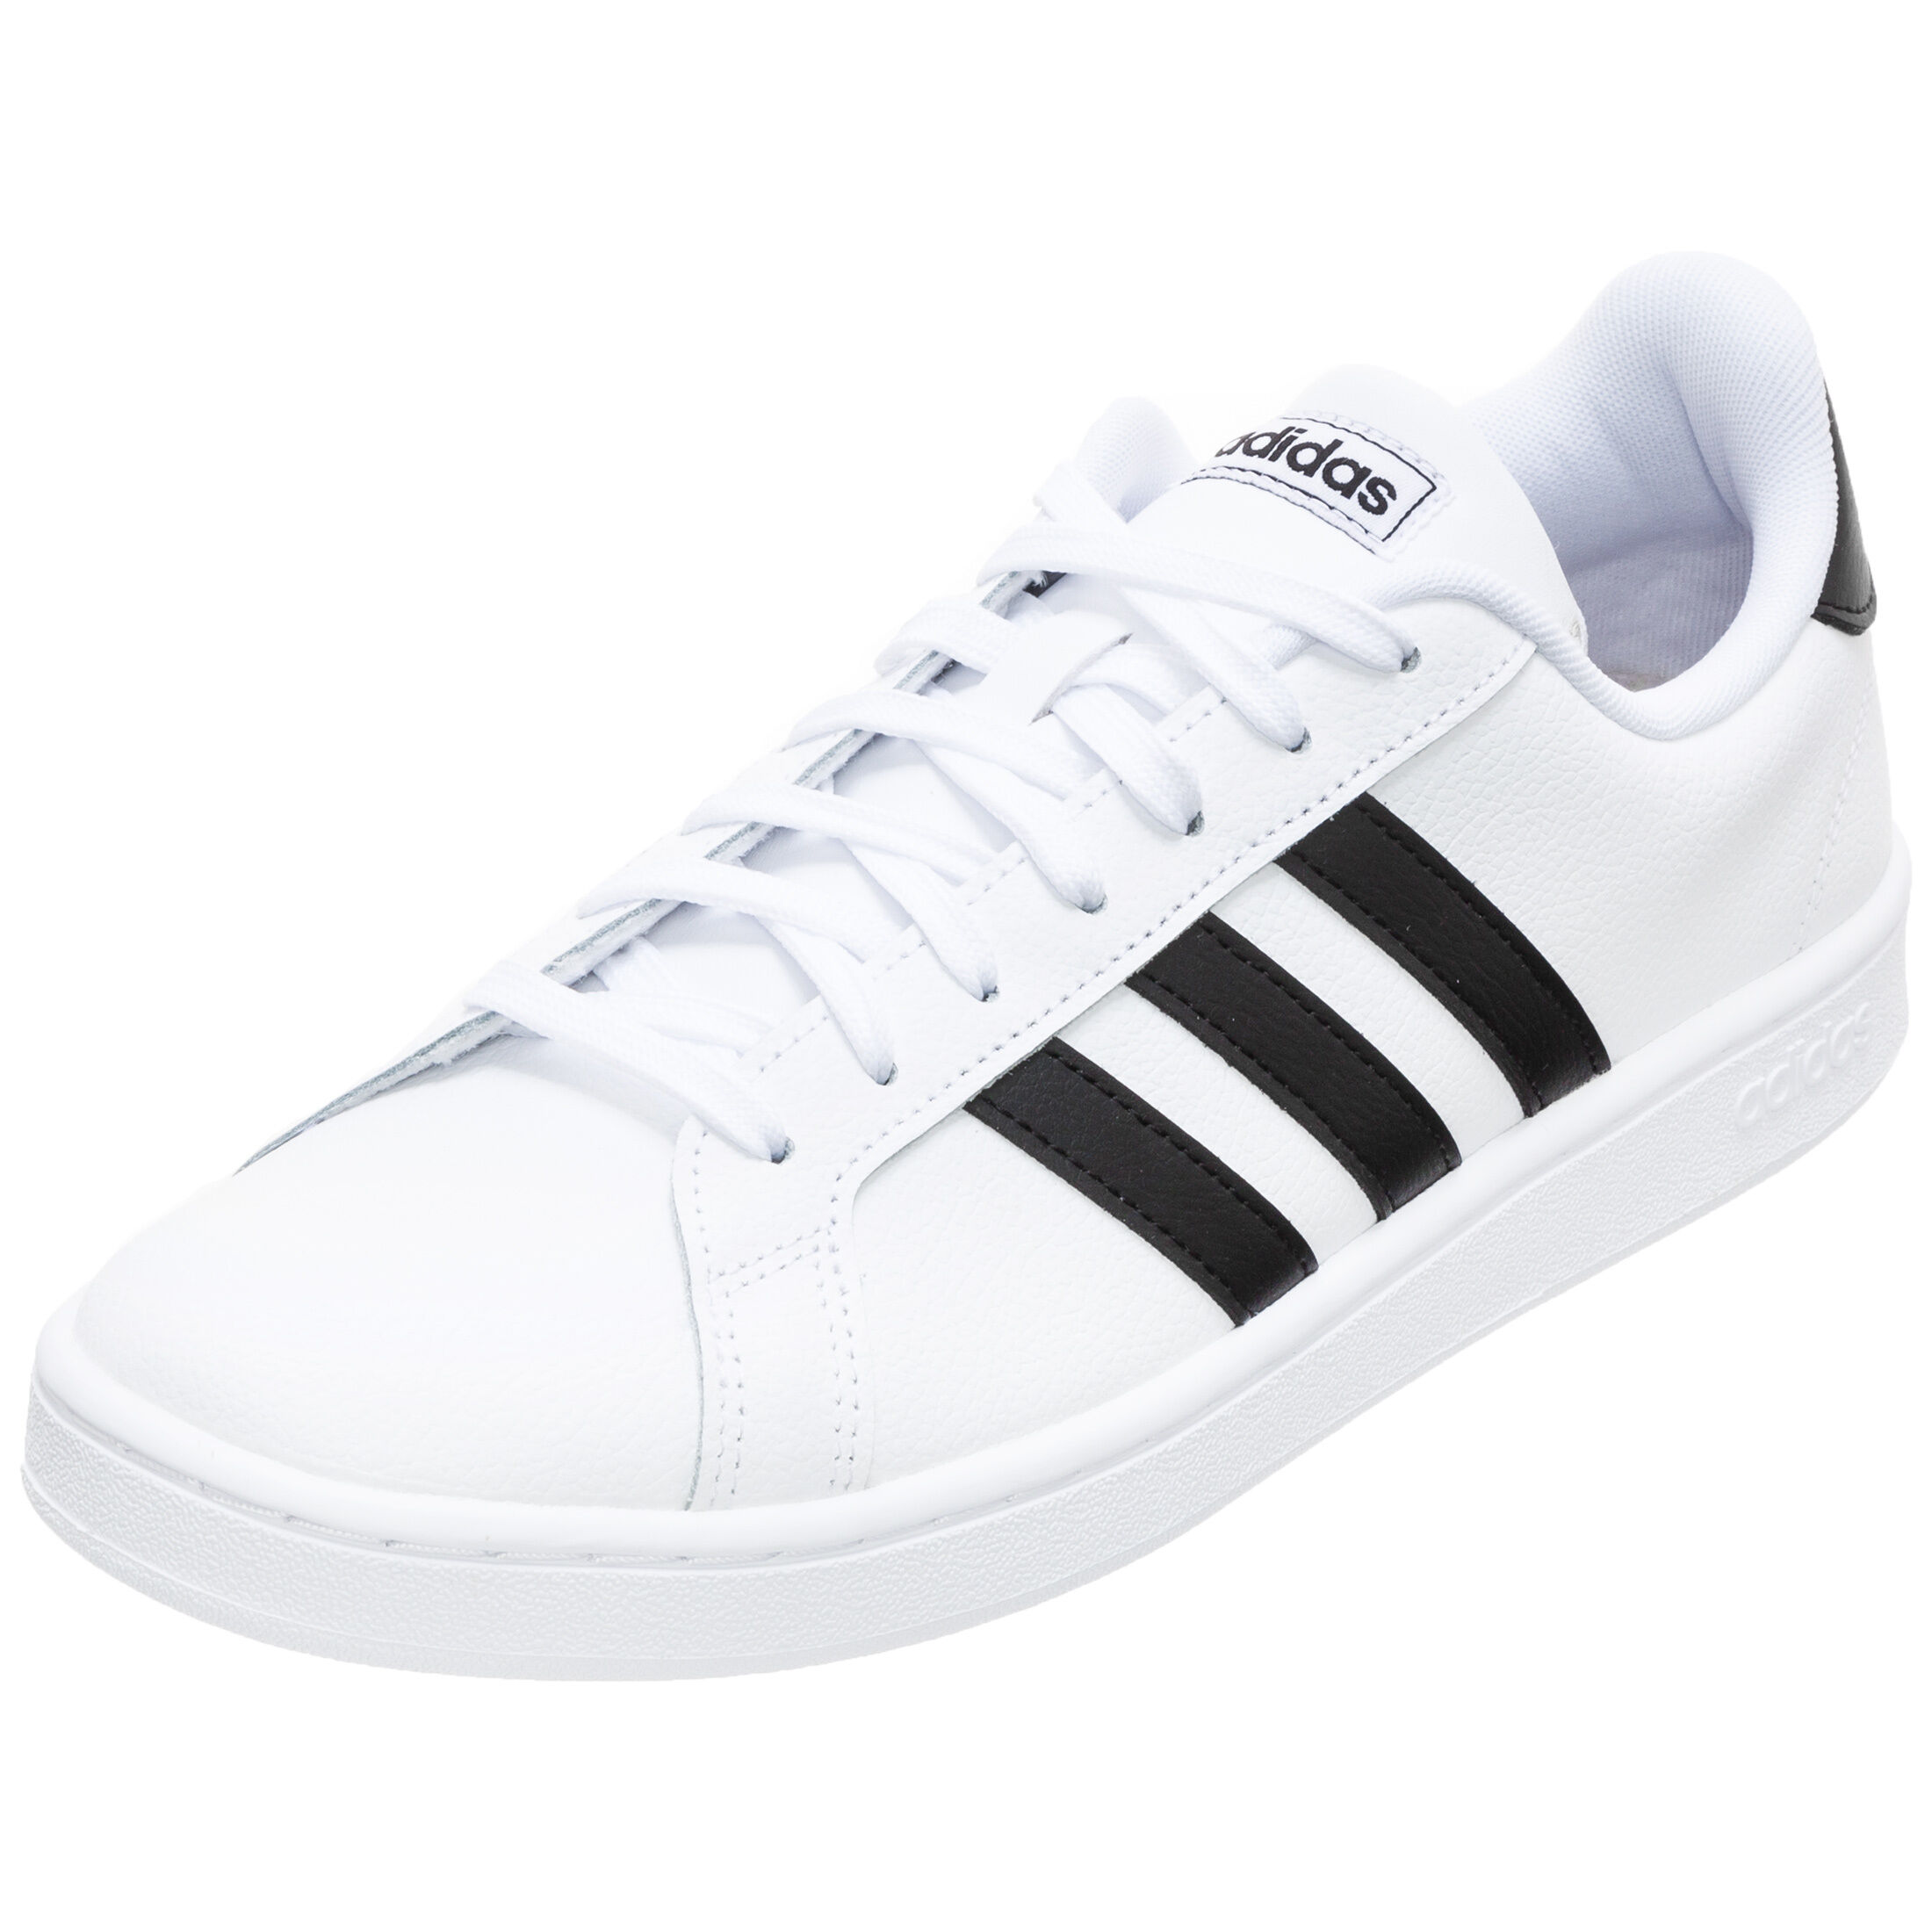 adidas Sneaker Damen   Sneaker Shop Lifestyle bei OUTFITTER